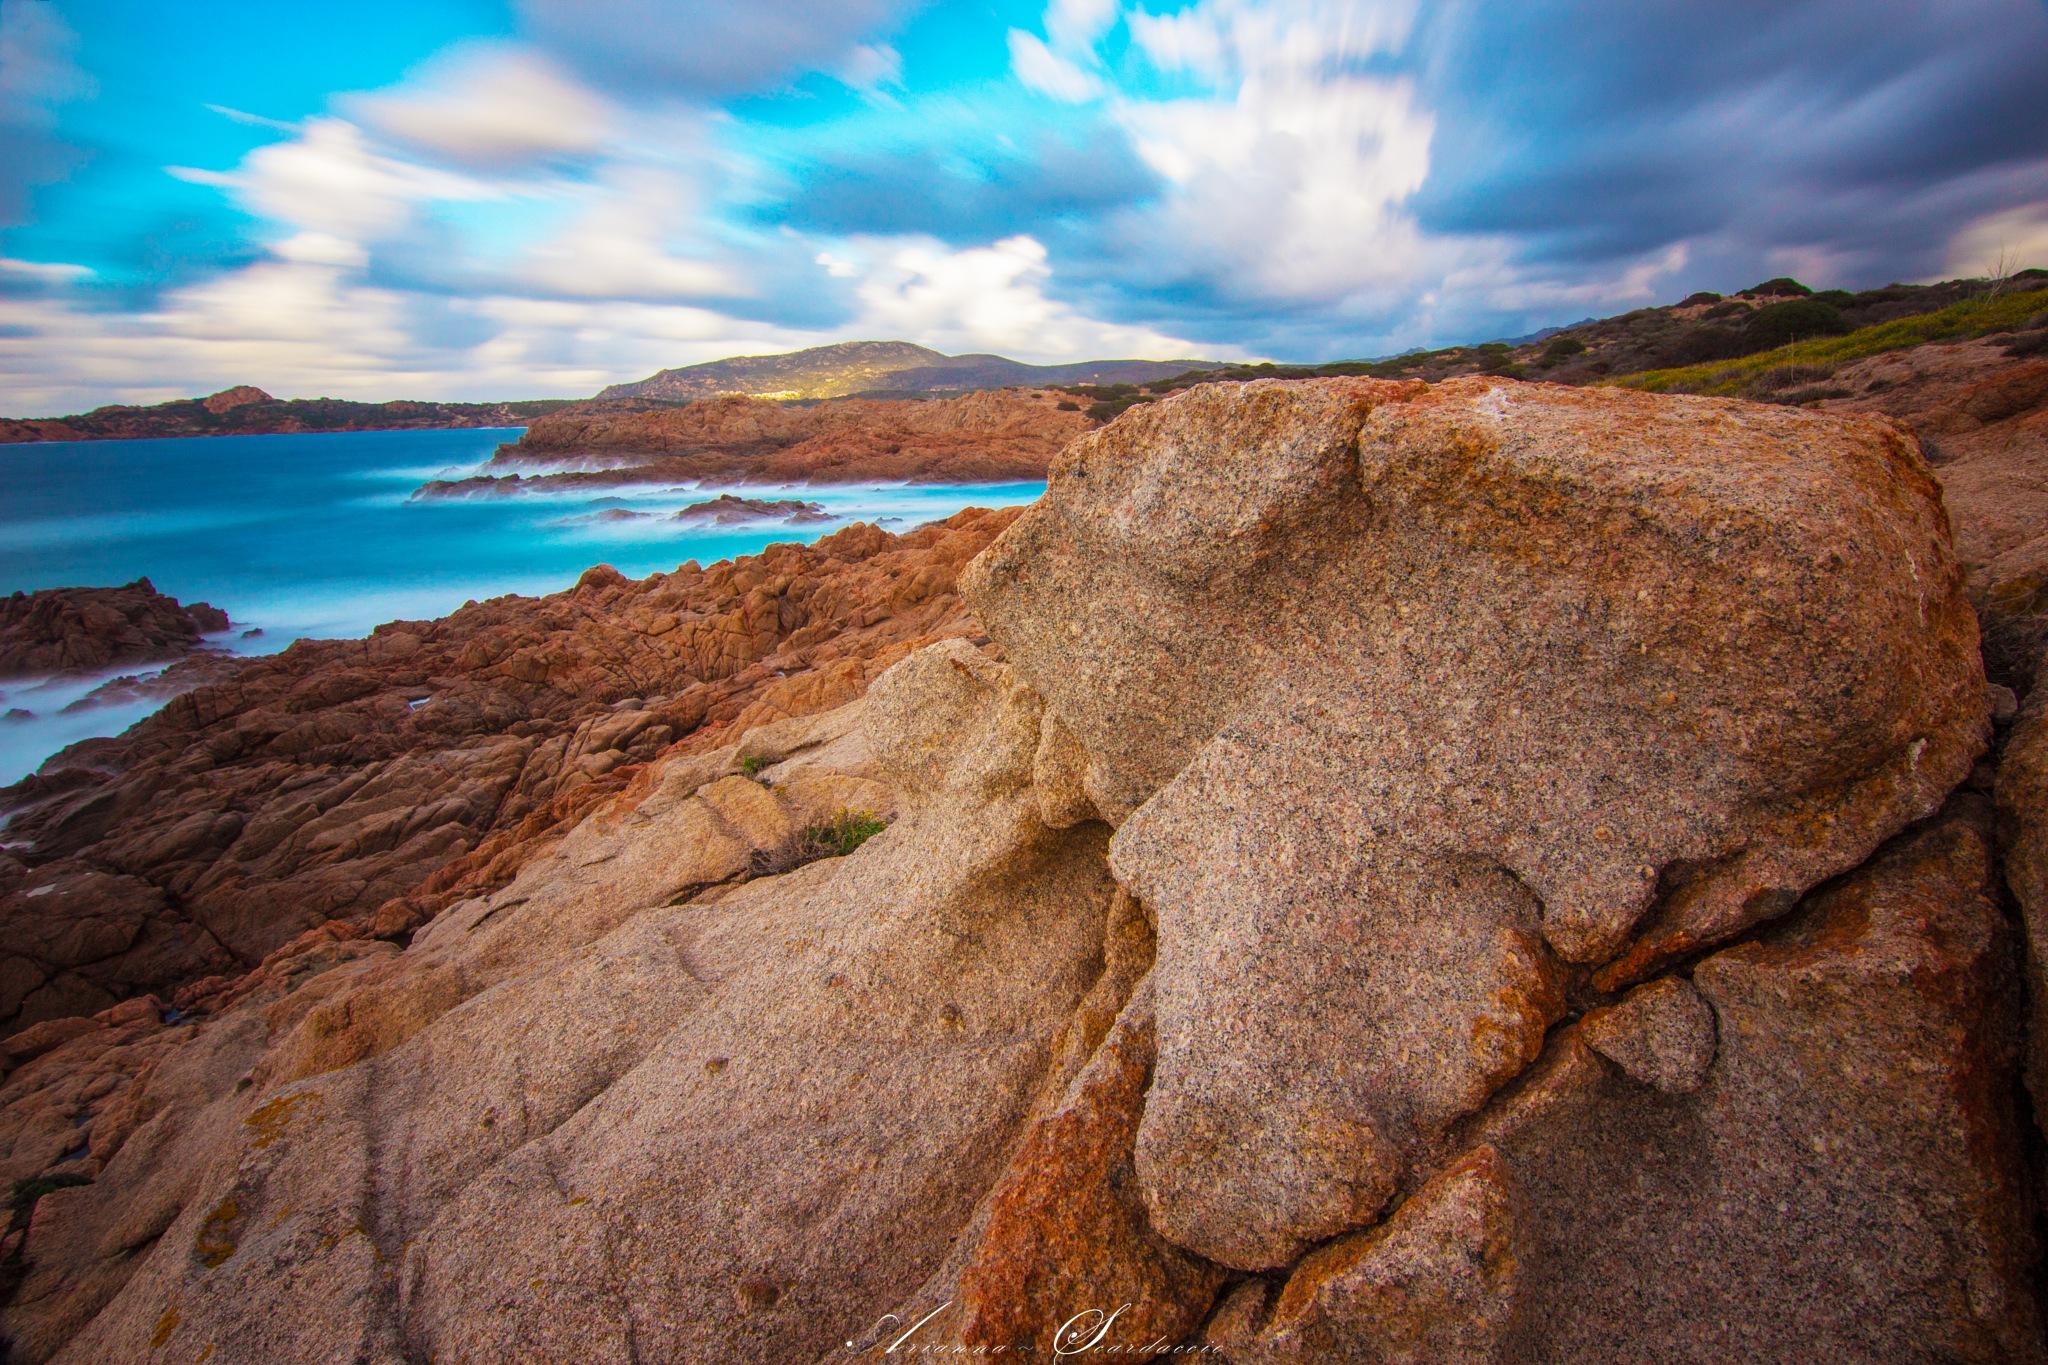 Sky, sea and rocks  by Arianna Scardaccio